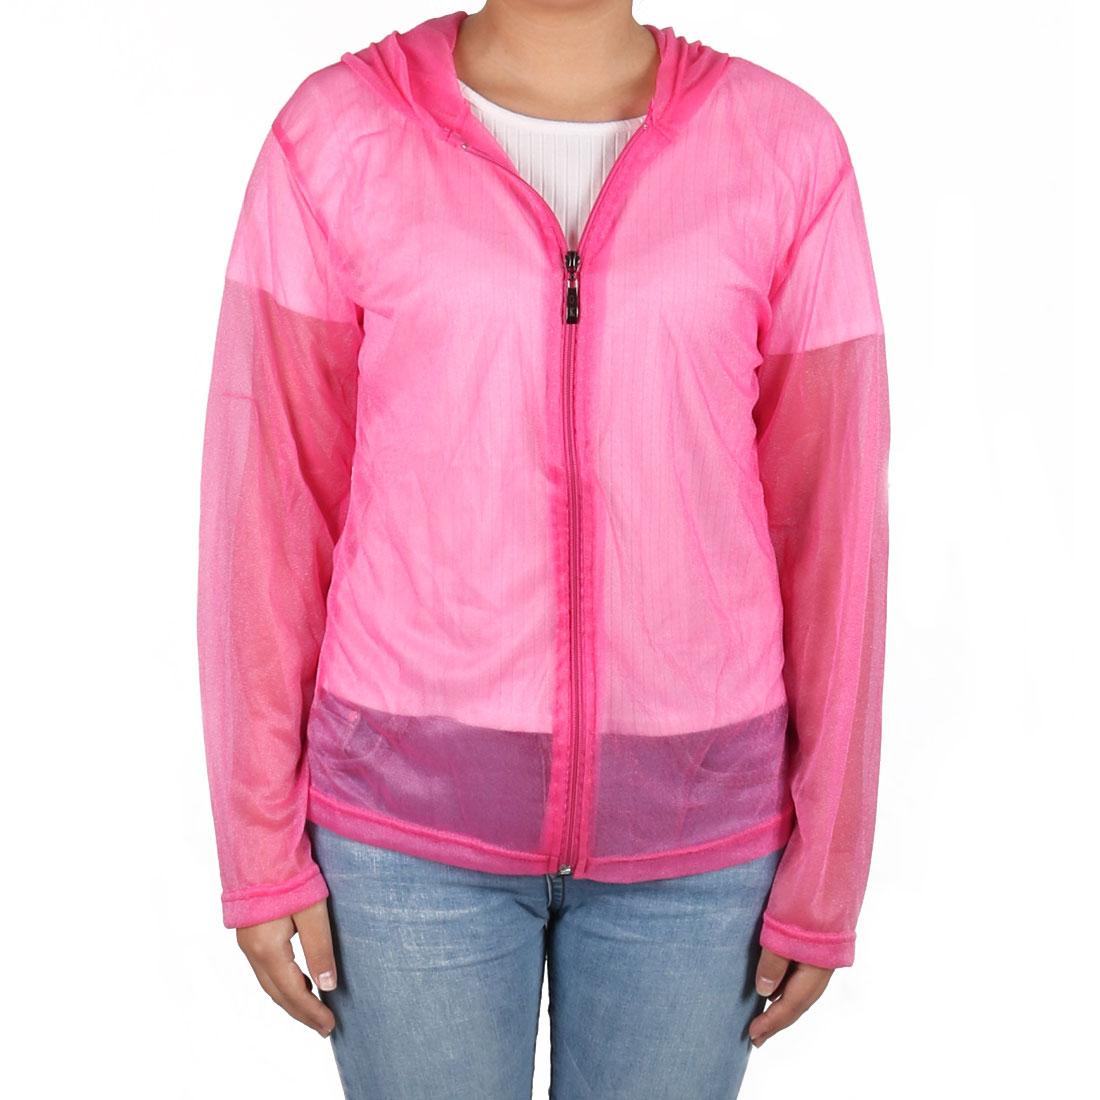 Outdoor Women Summer Sun UV Protection Transparent Clothing Hooded Jacket Fuchsia